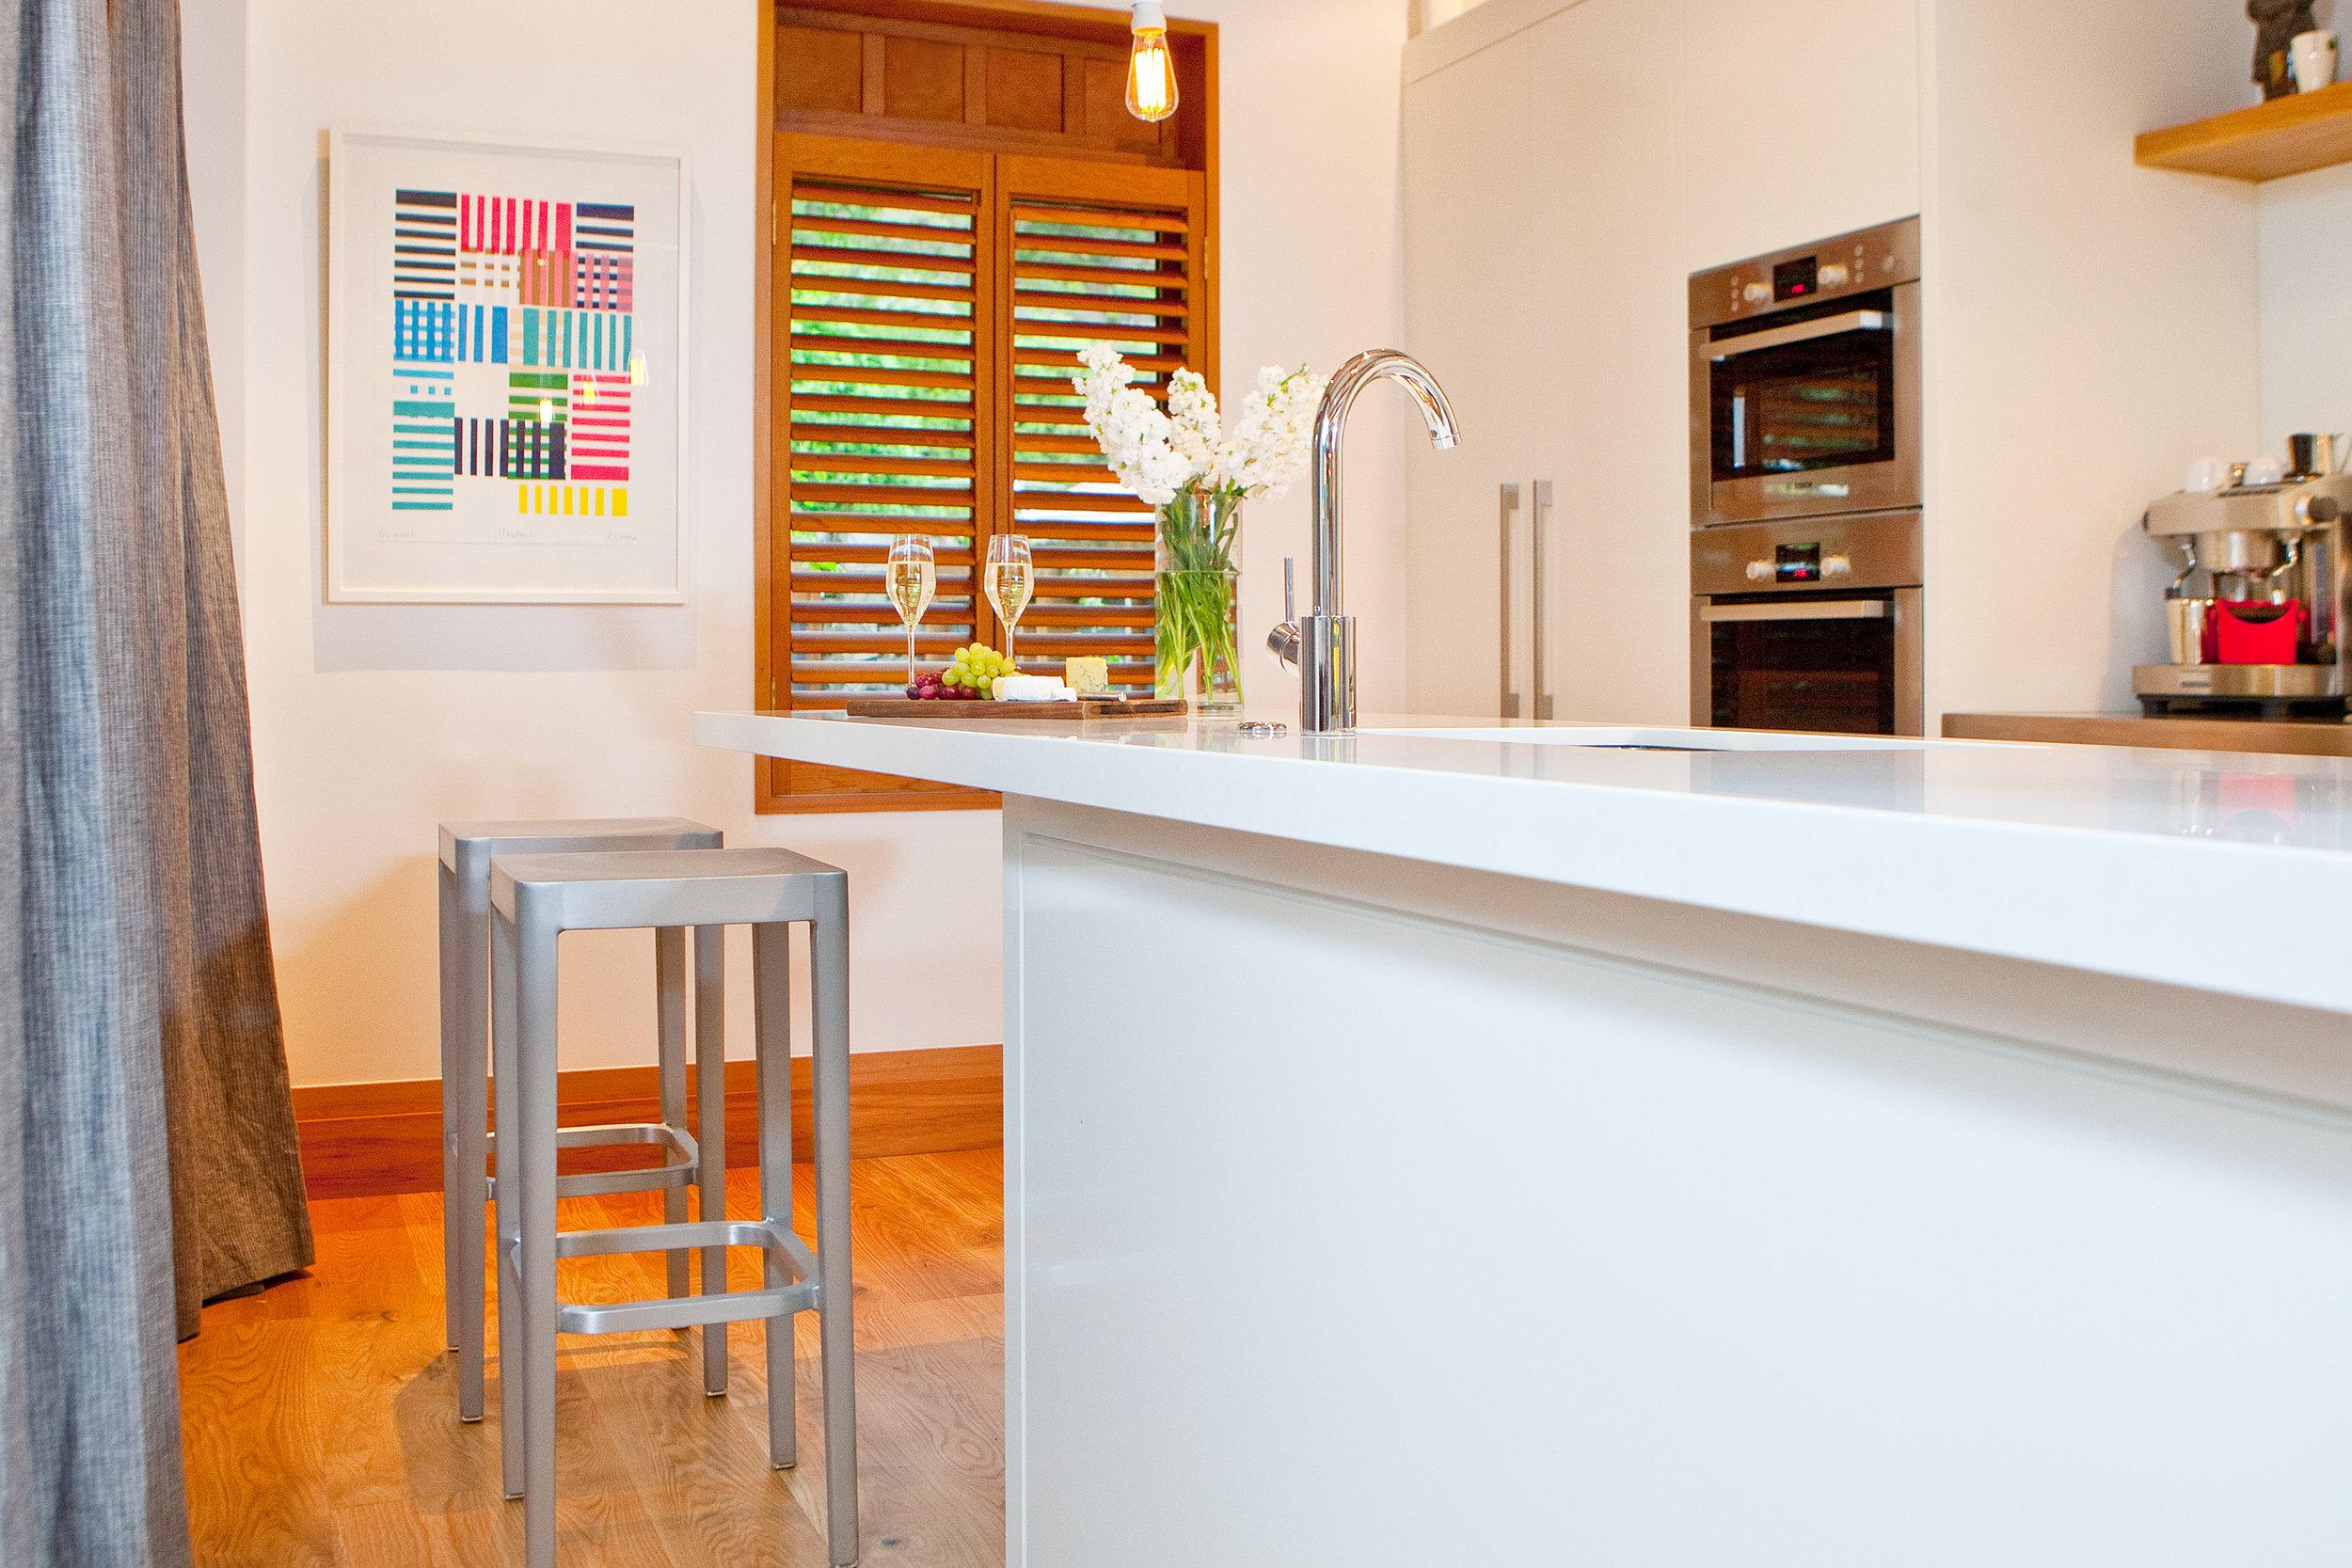 In Haus Design Imagery 158.jpg